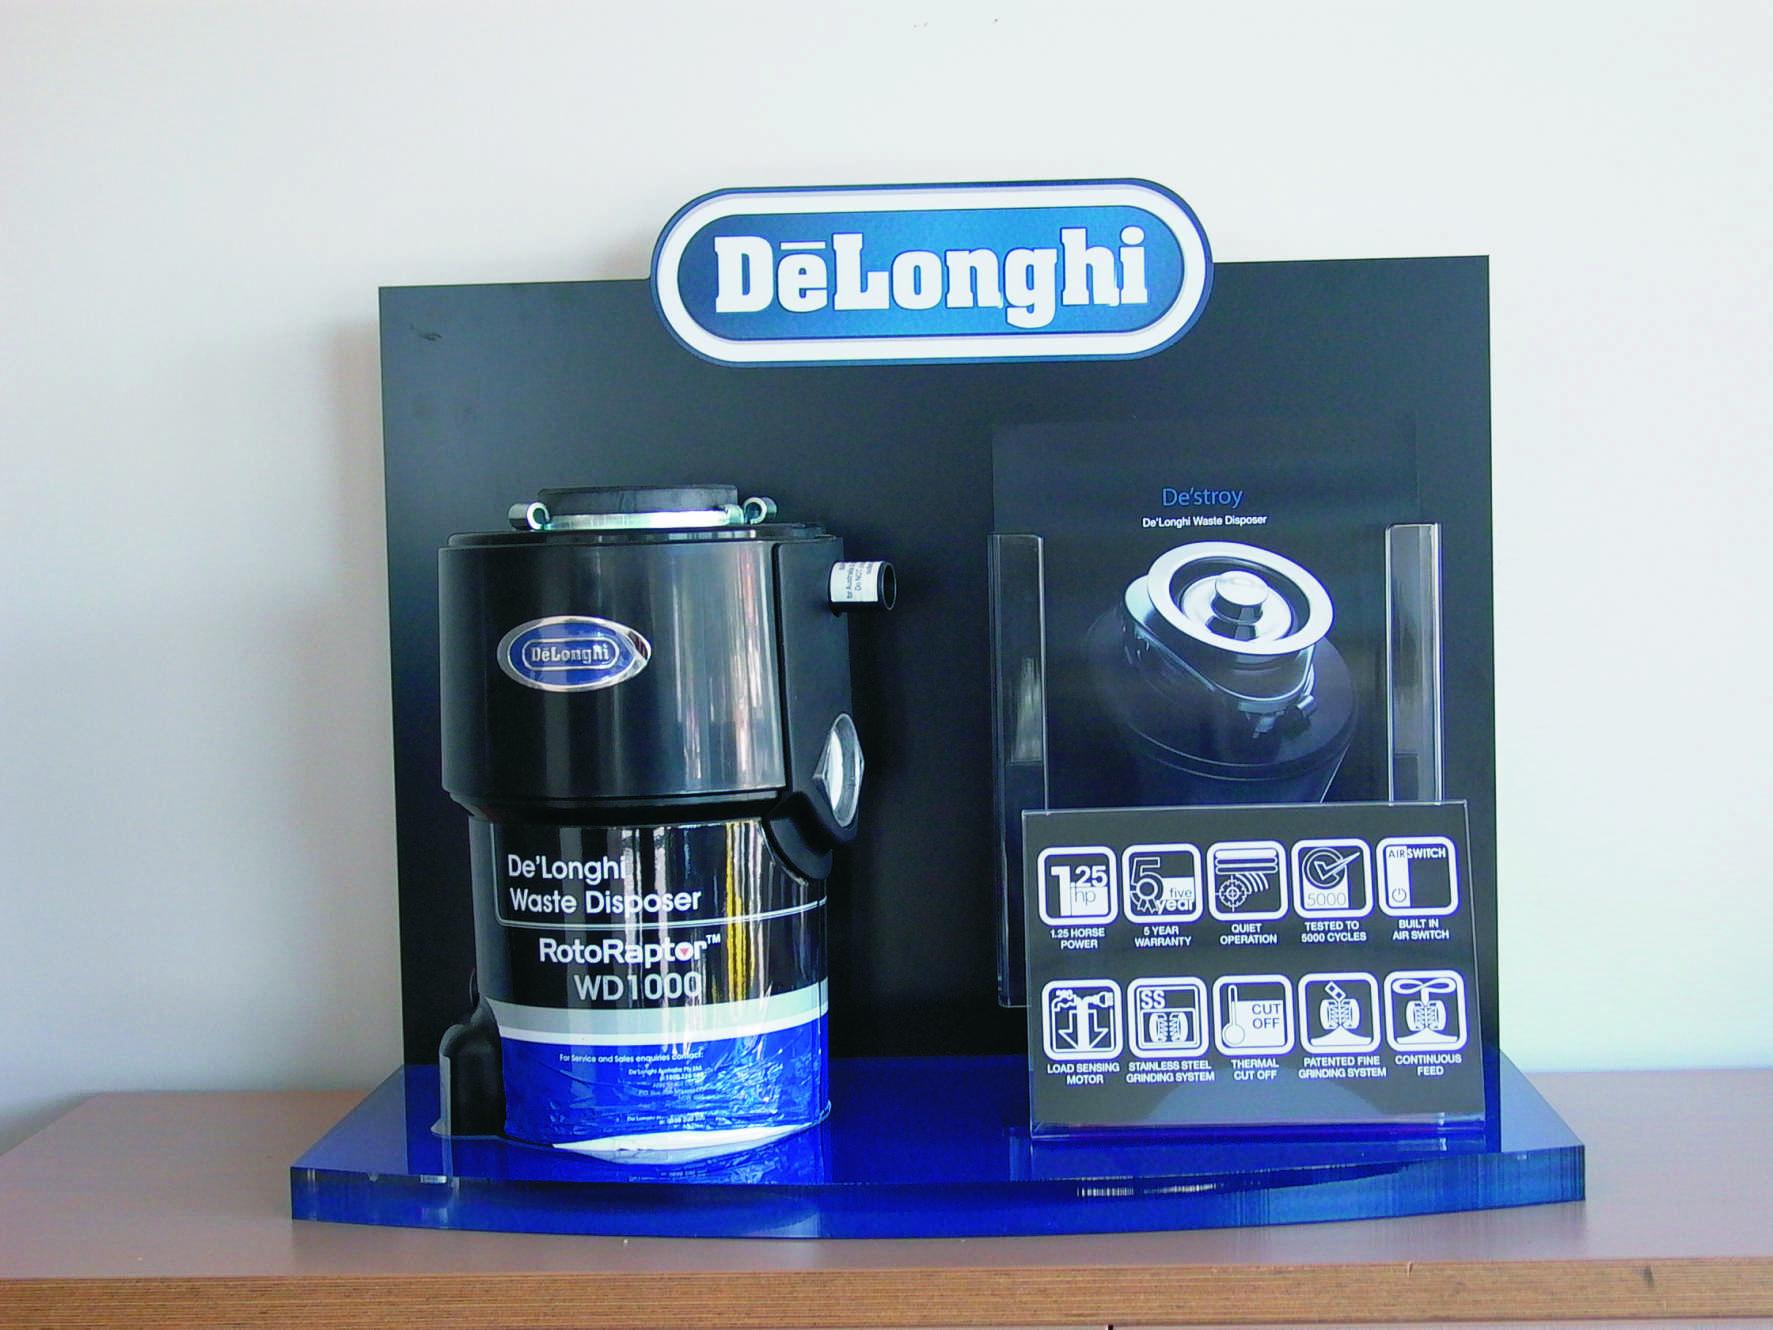 Delonghi waste disposal